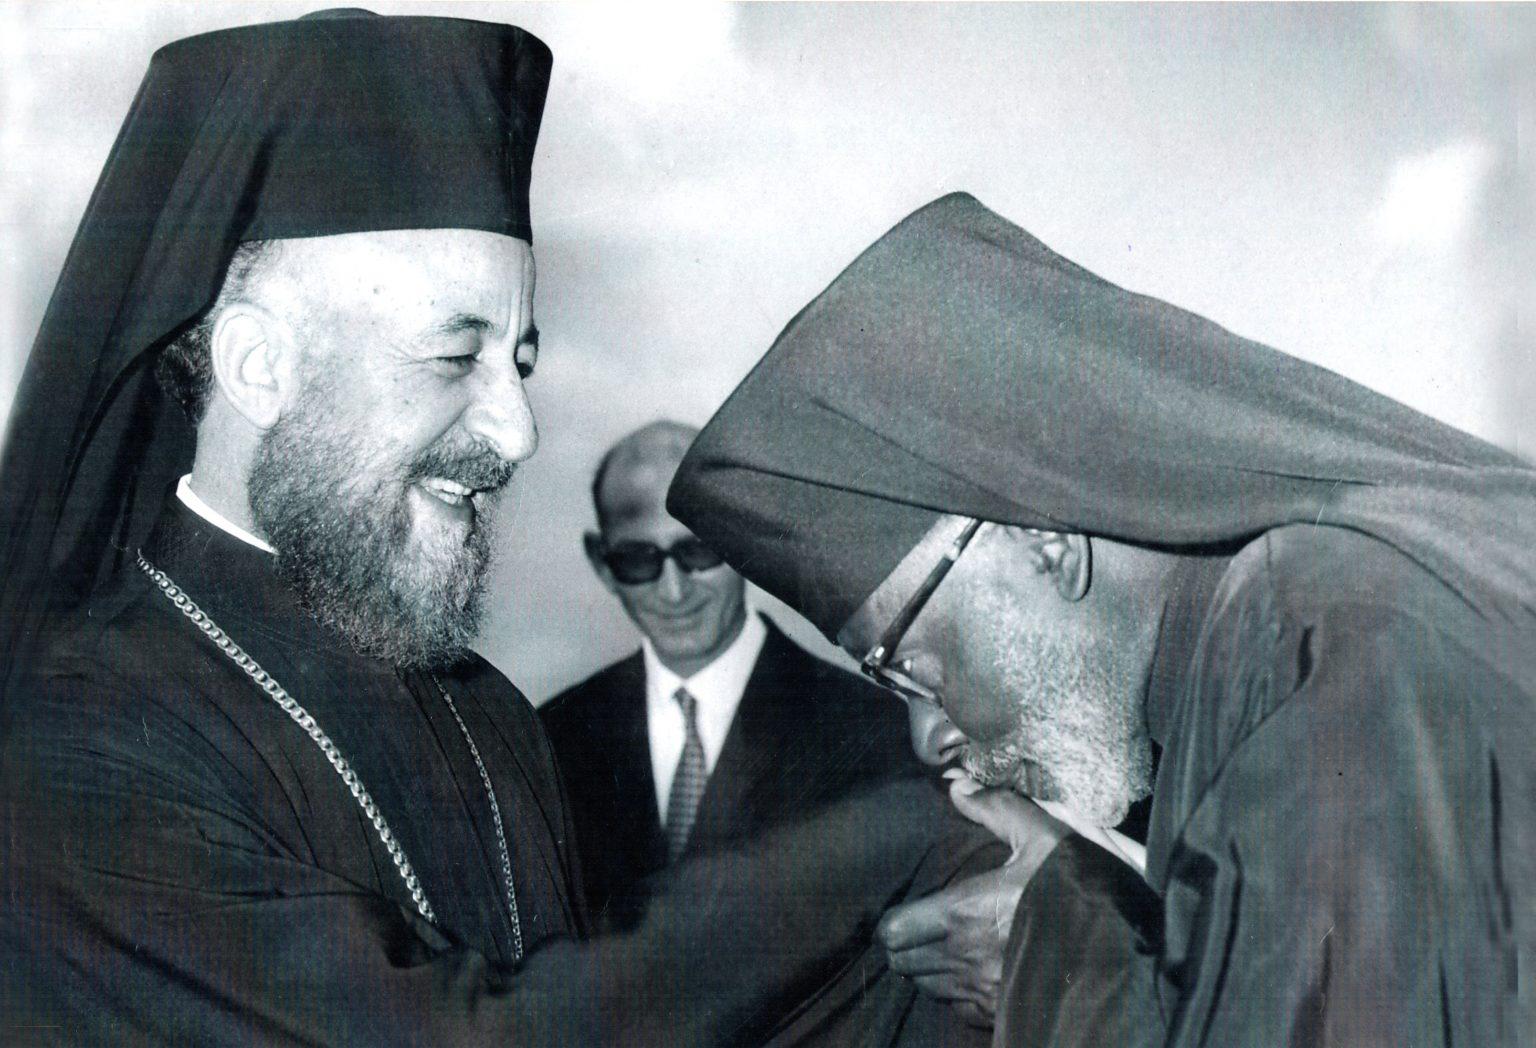 Makarios meets Archimandrite George Gathuna